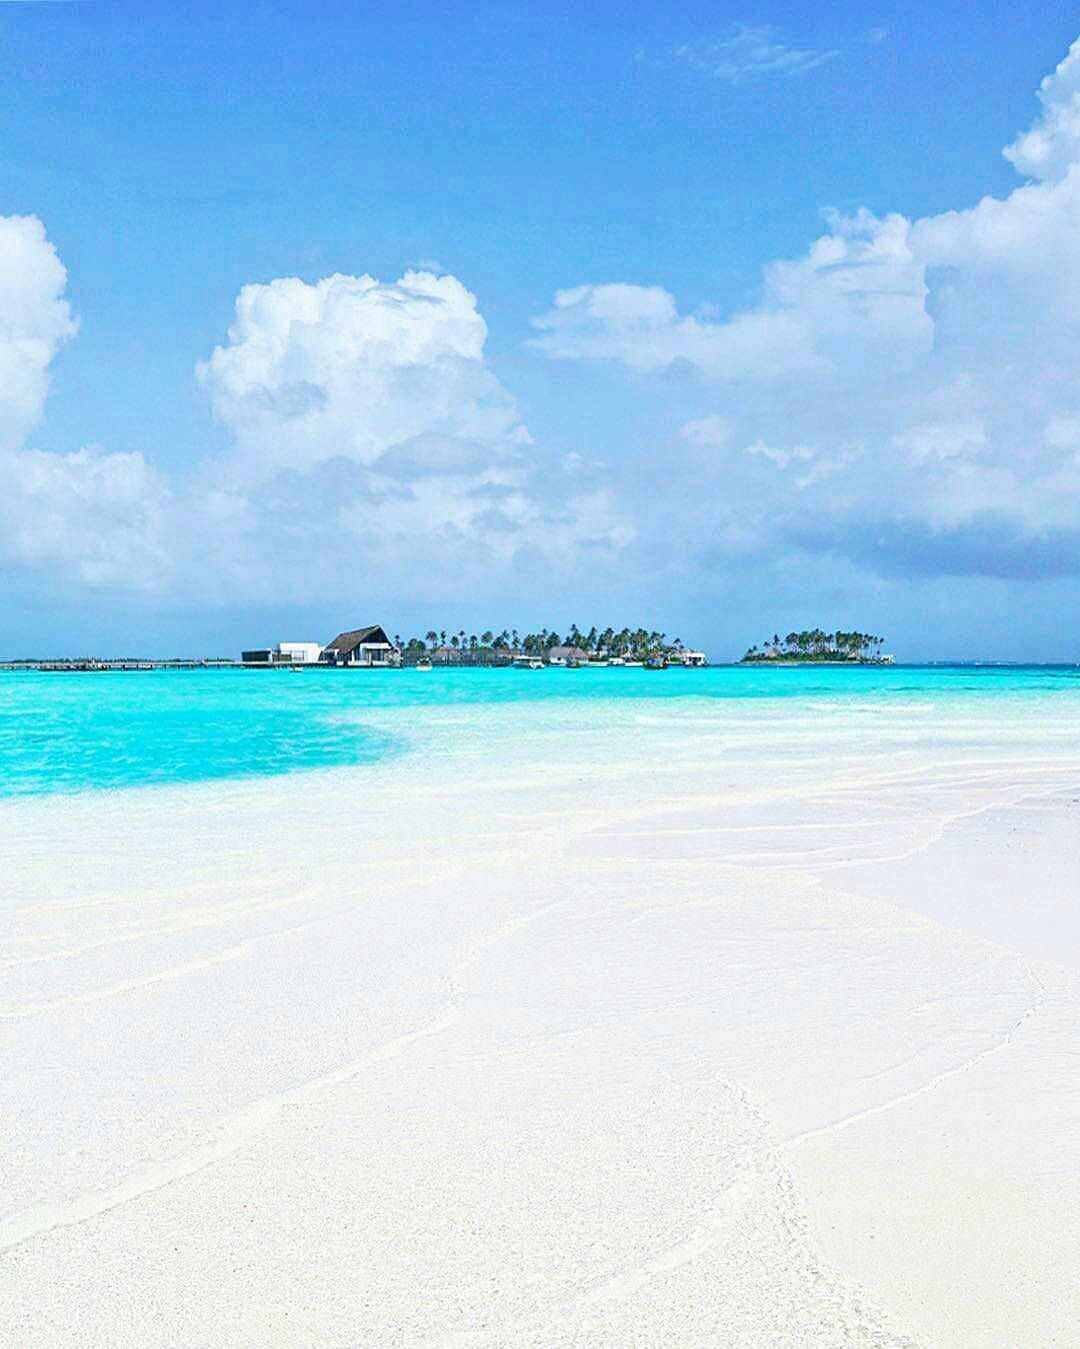 The Maldives Islands Cheval Blanc Randheli Island Resort Maldives Malediven Reiseziele Reisen